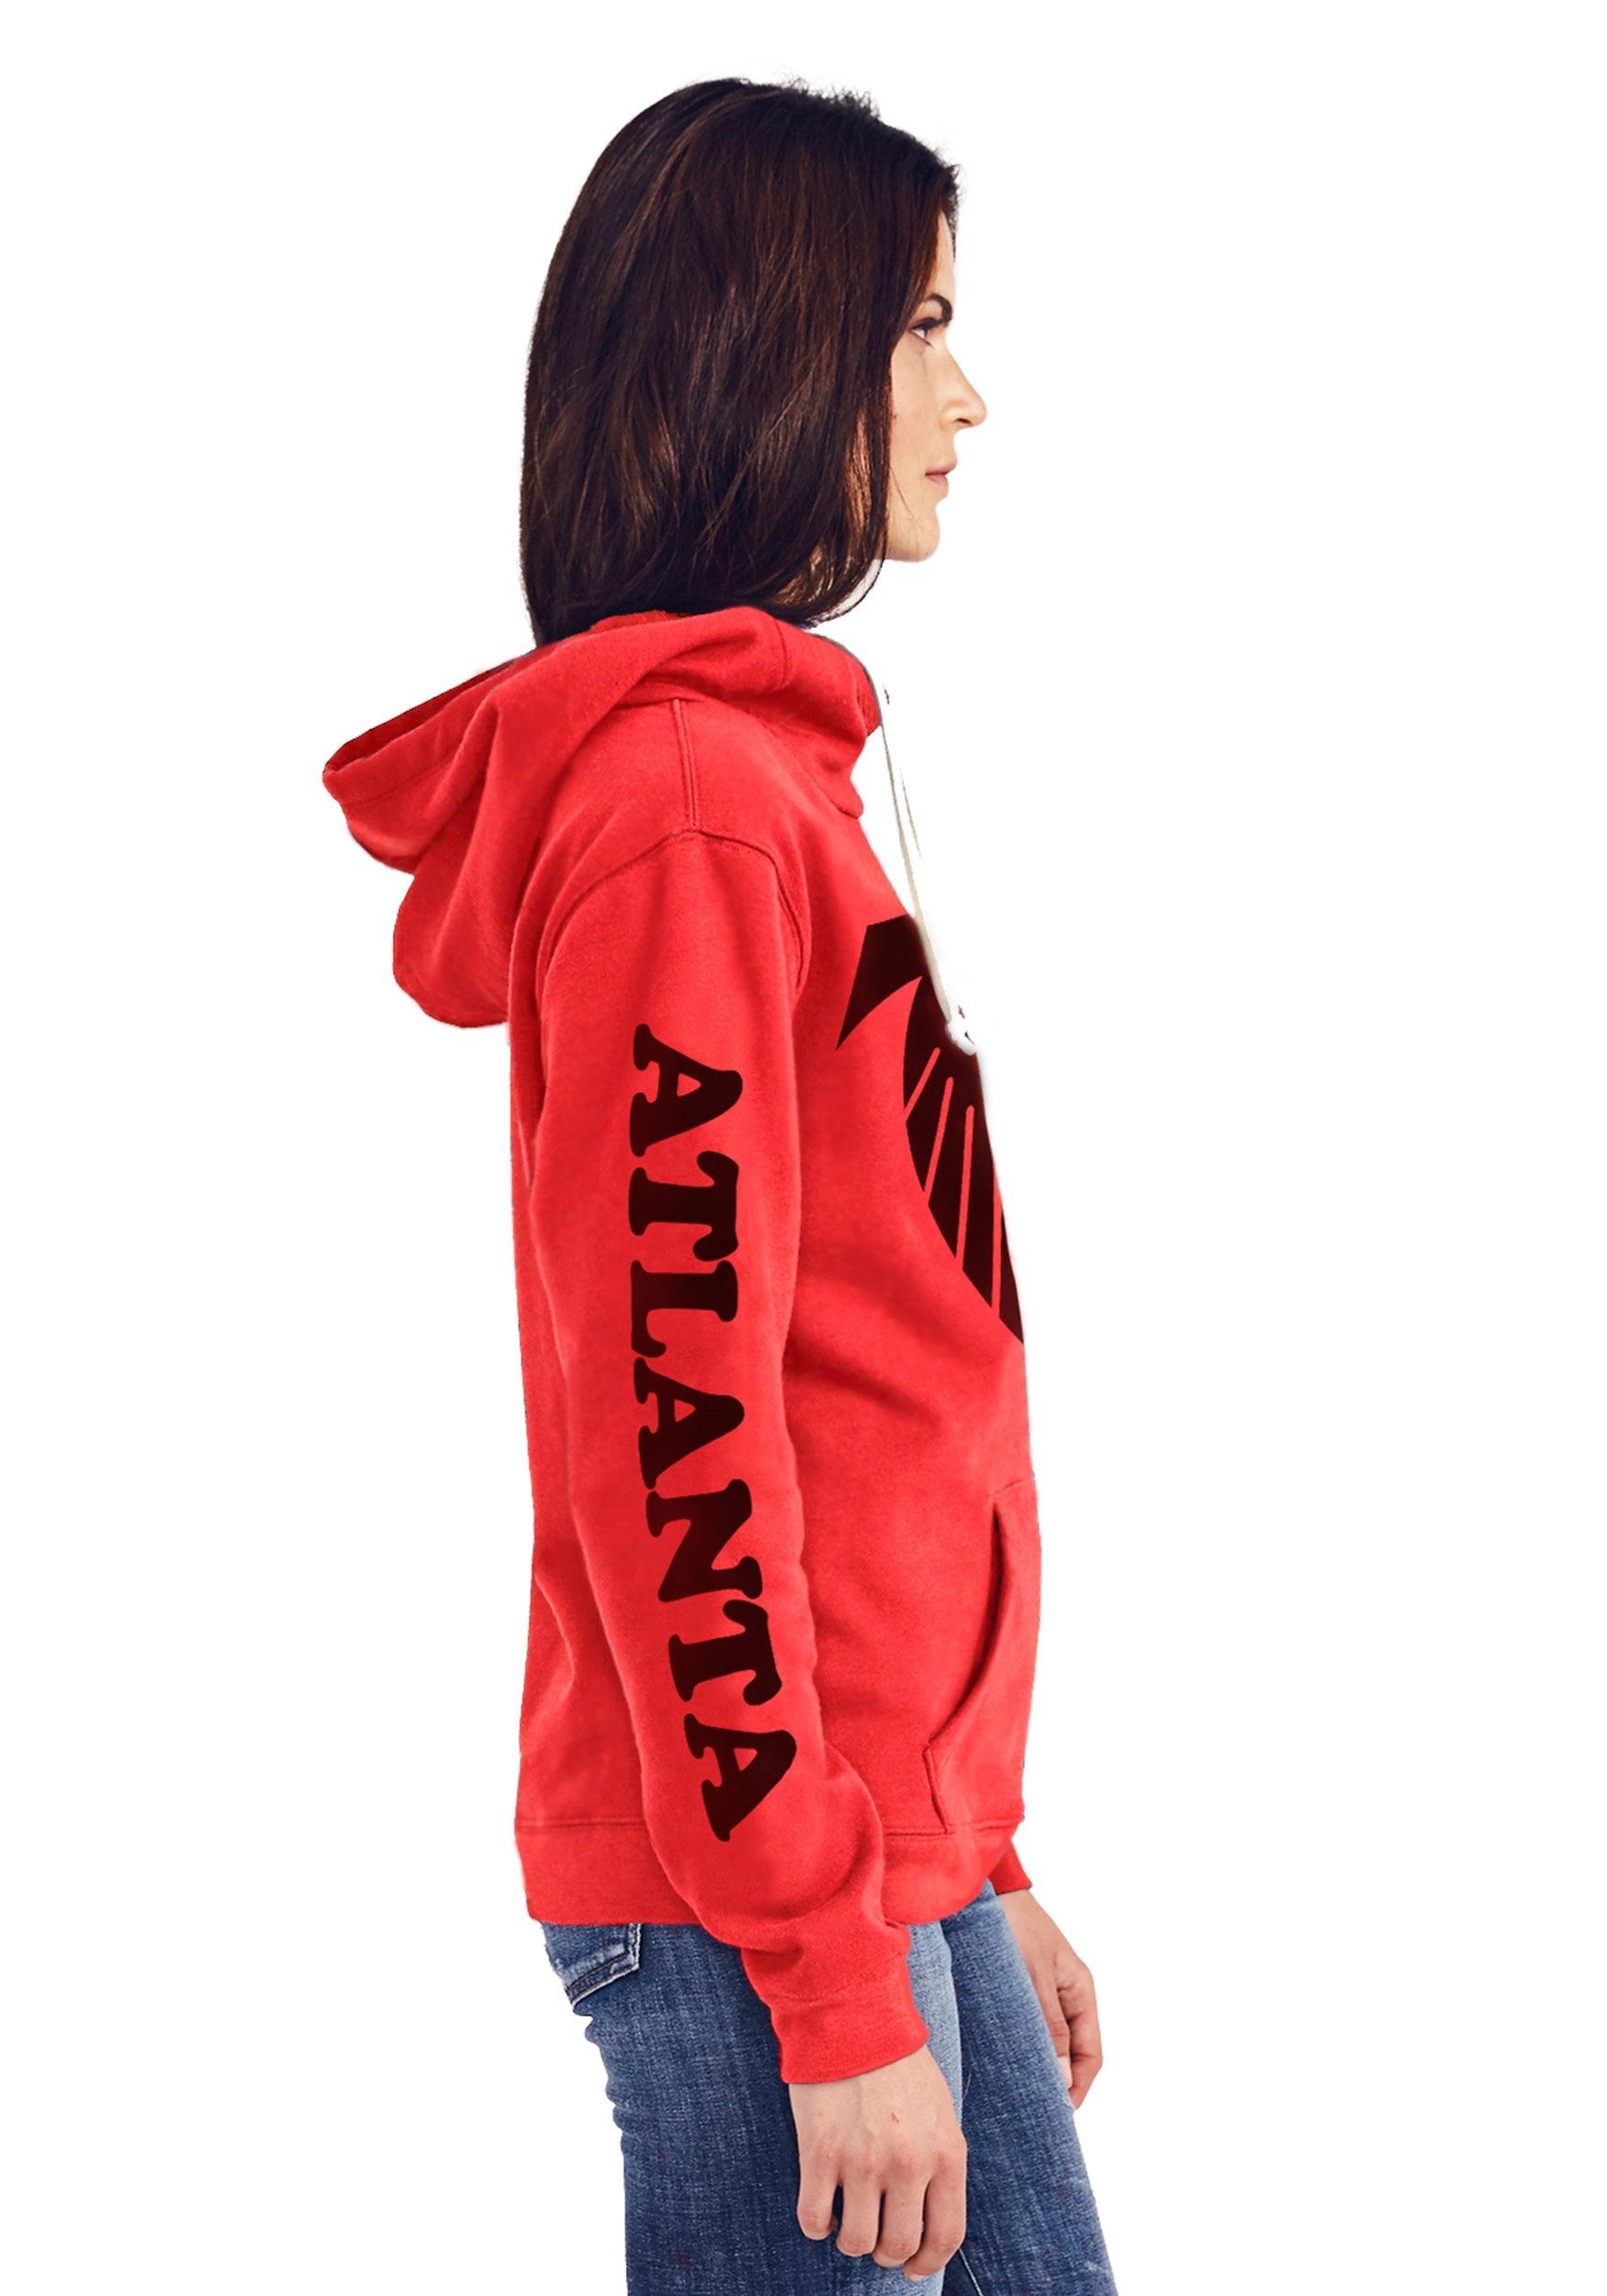 25a642c1 Atlanta Falcons Women's Cowl Neck Hooded Sweatshirt